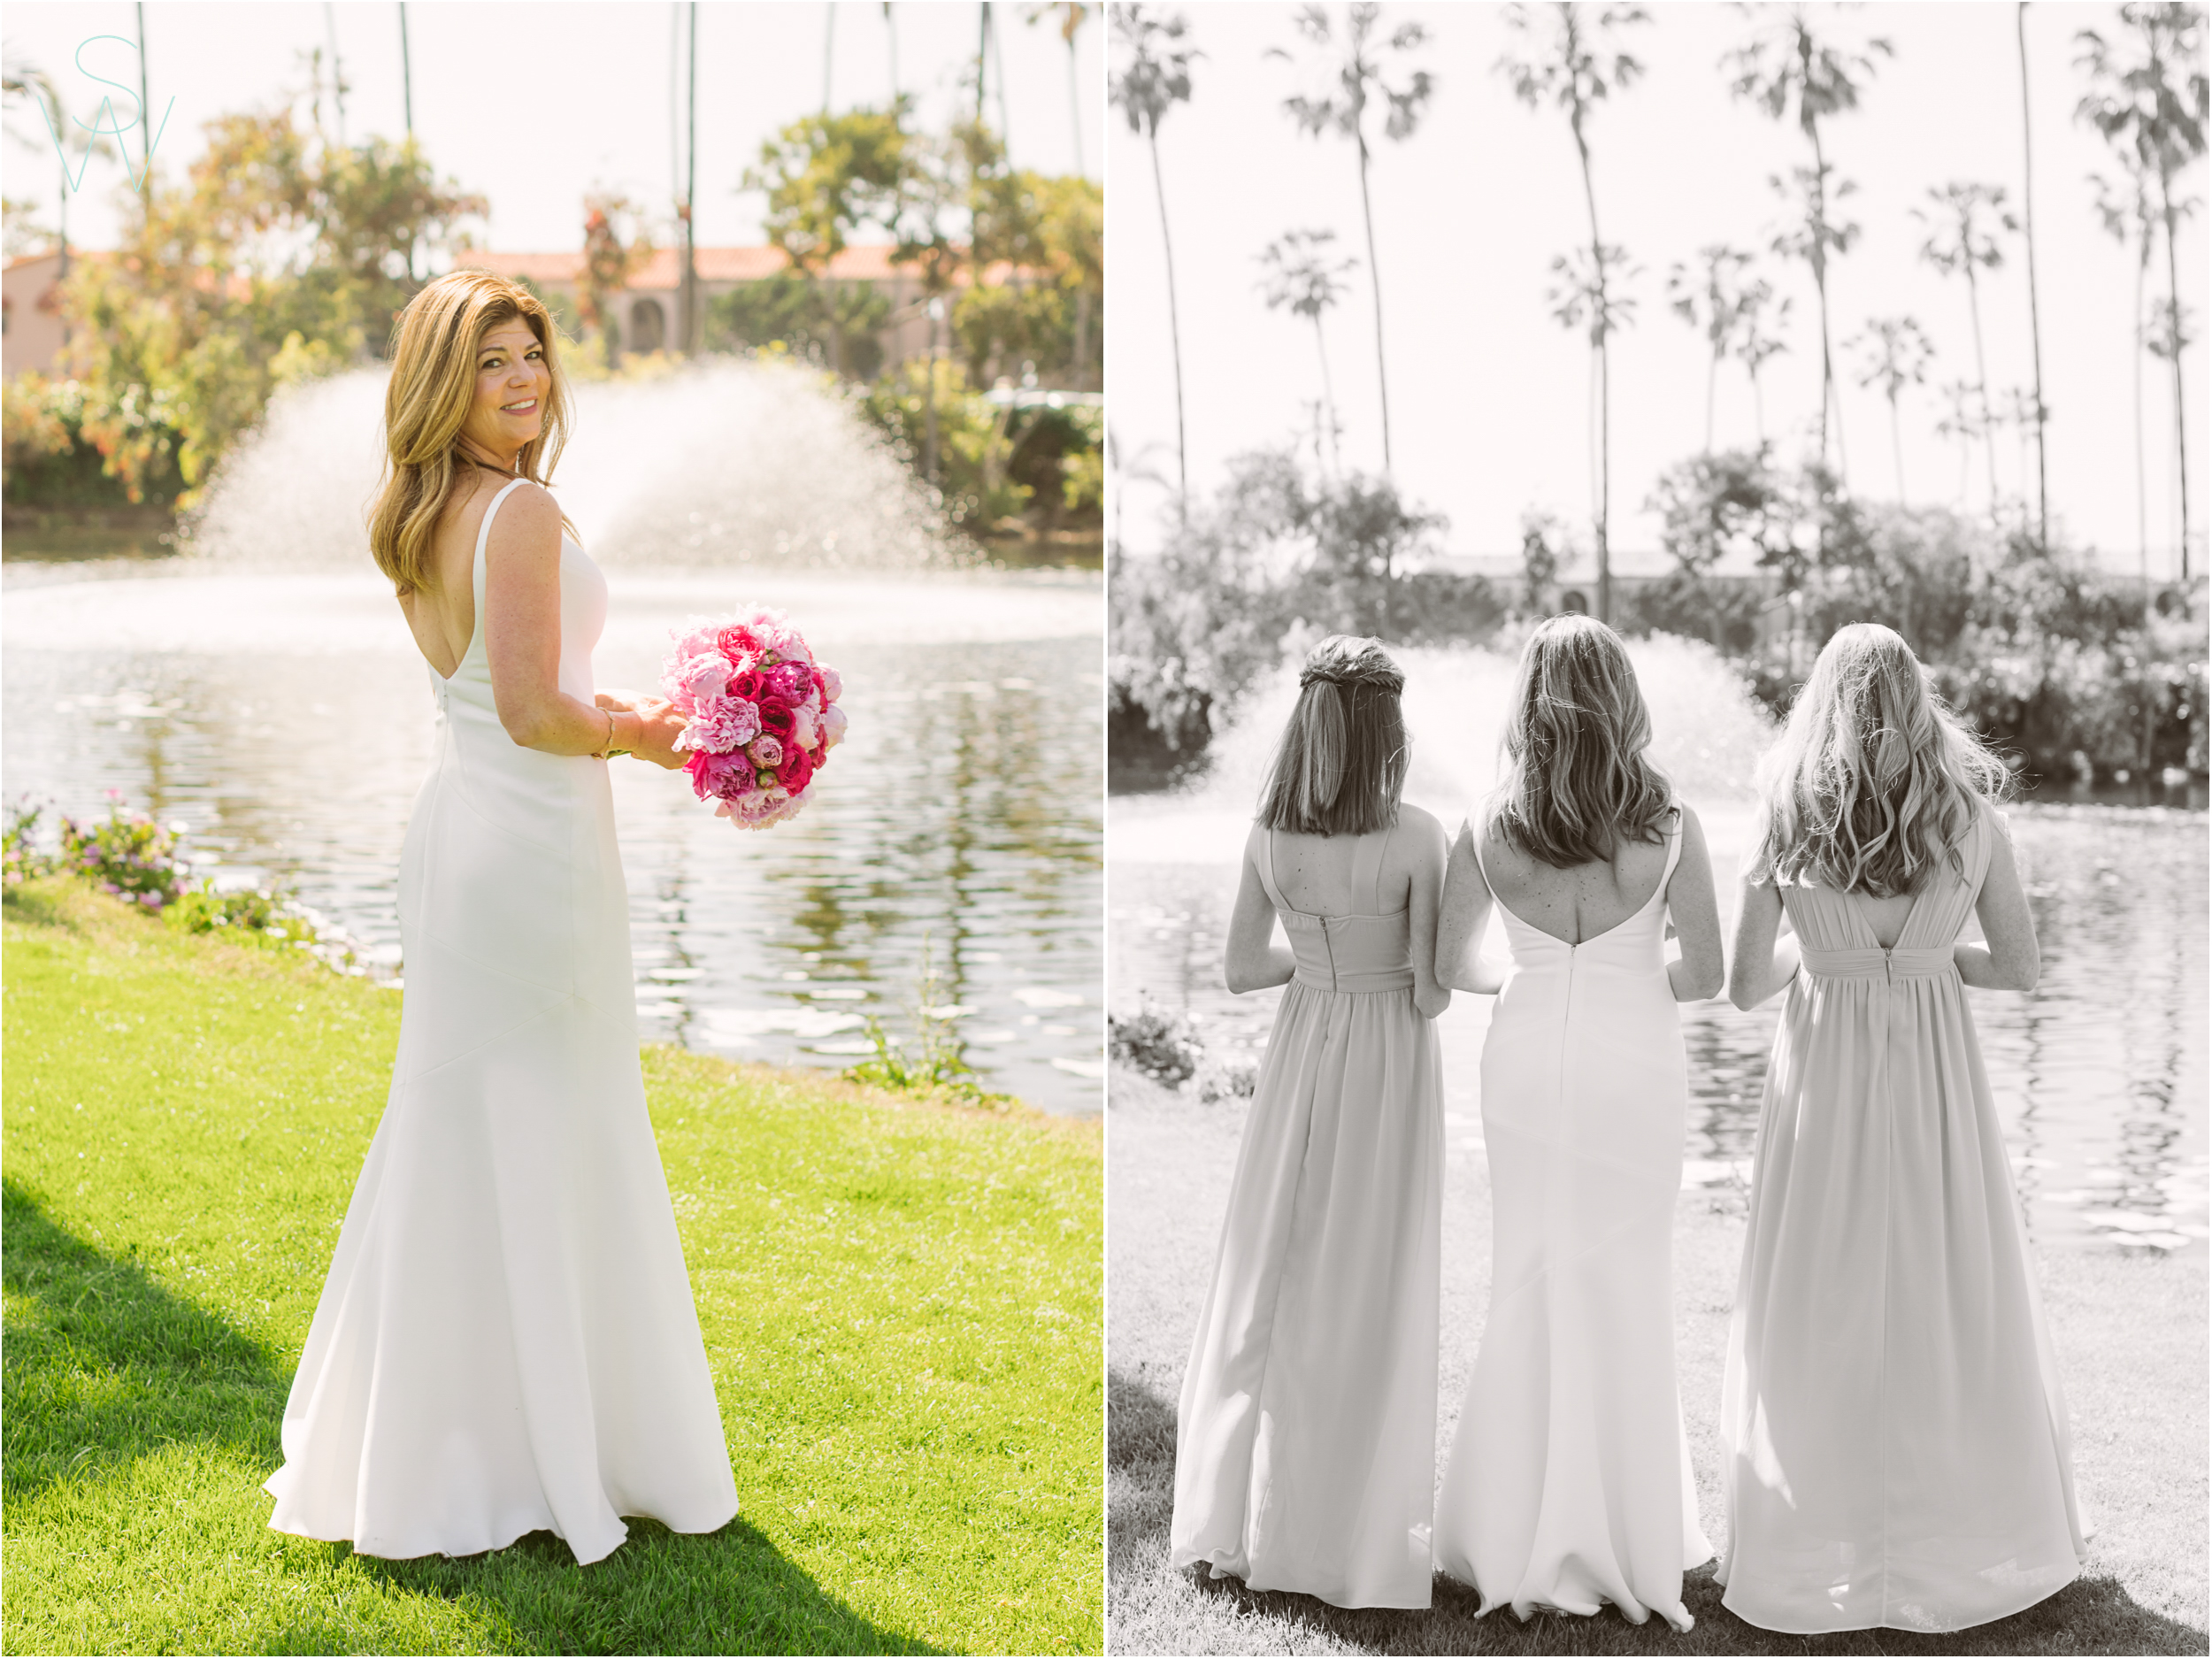 shewanders.wedding.photography.la.jolla-1005.jpg